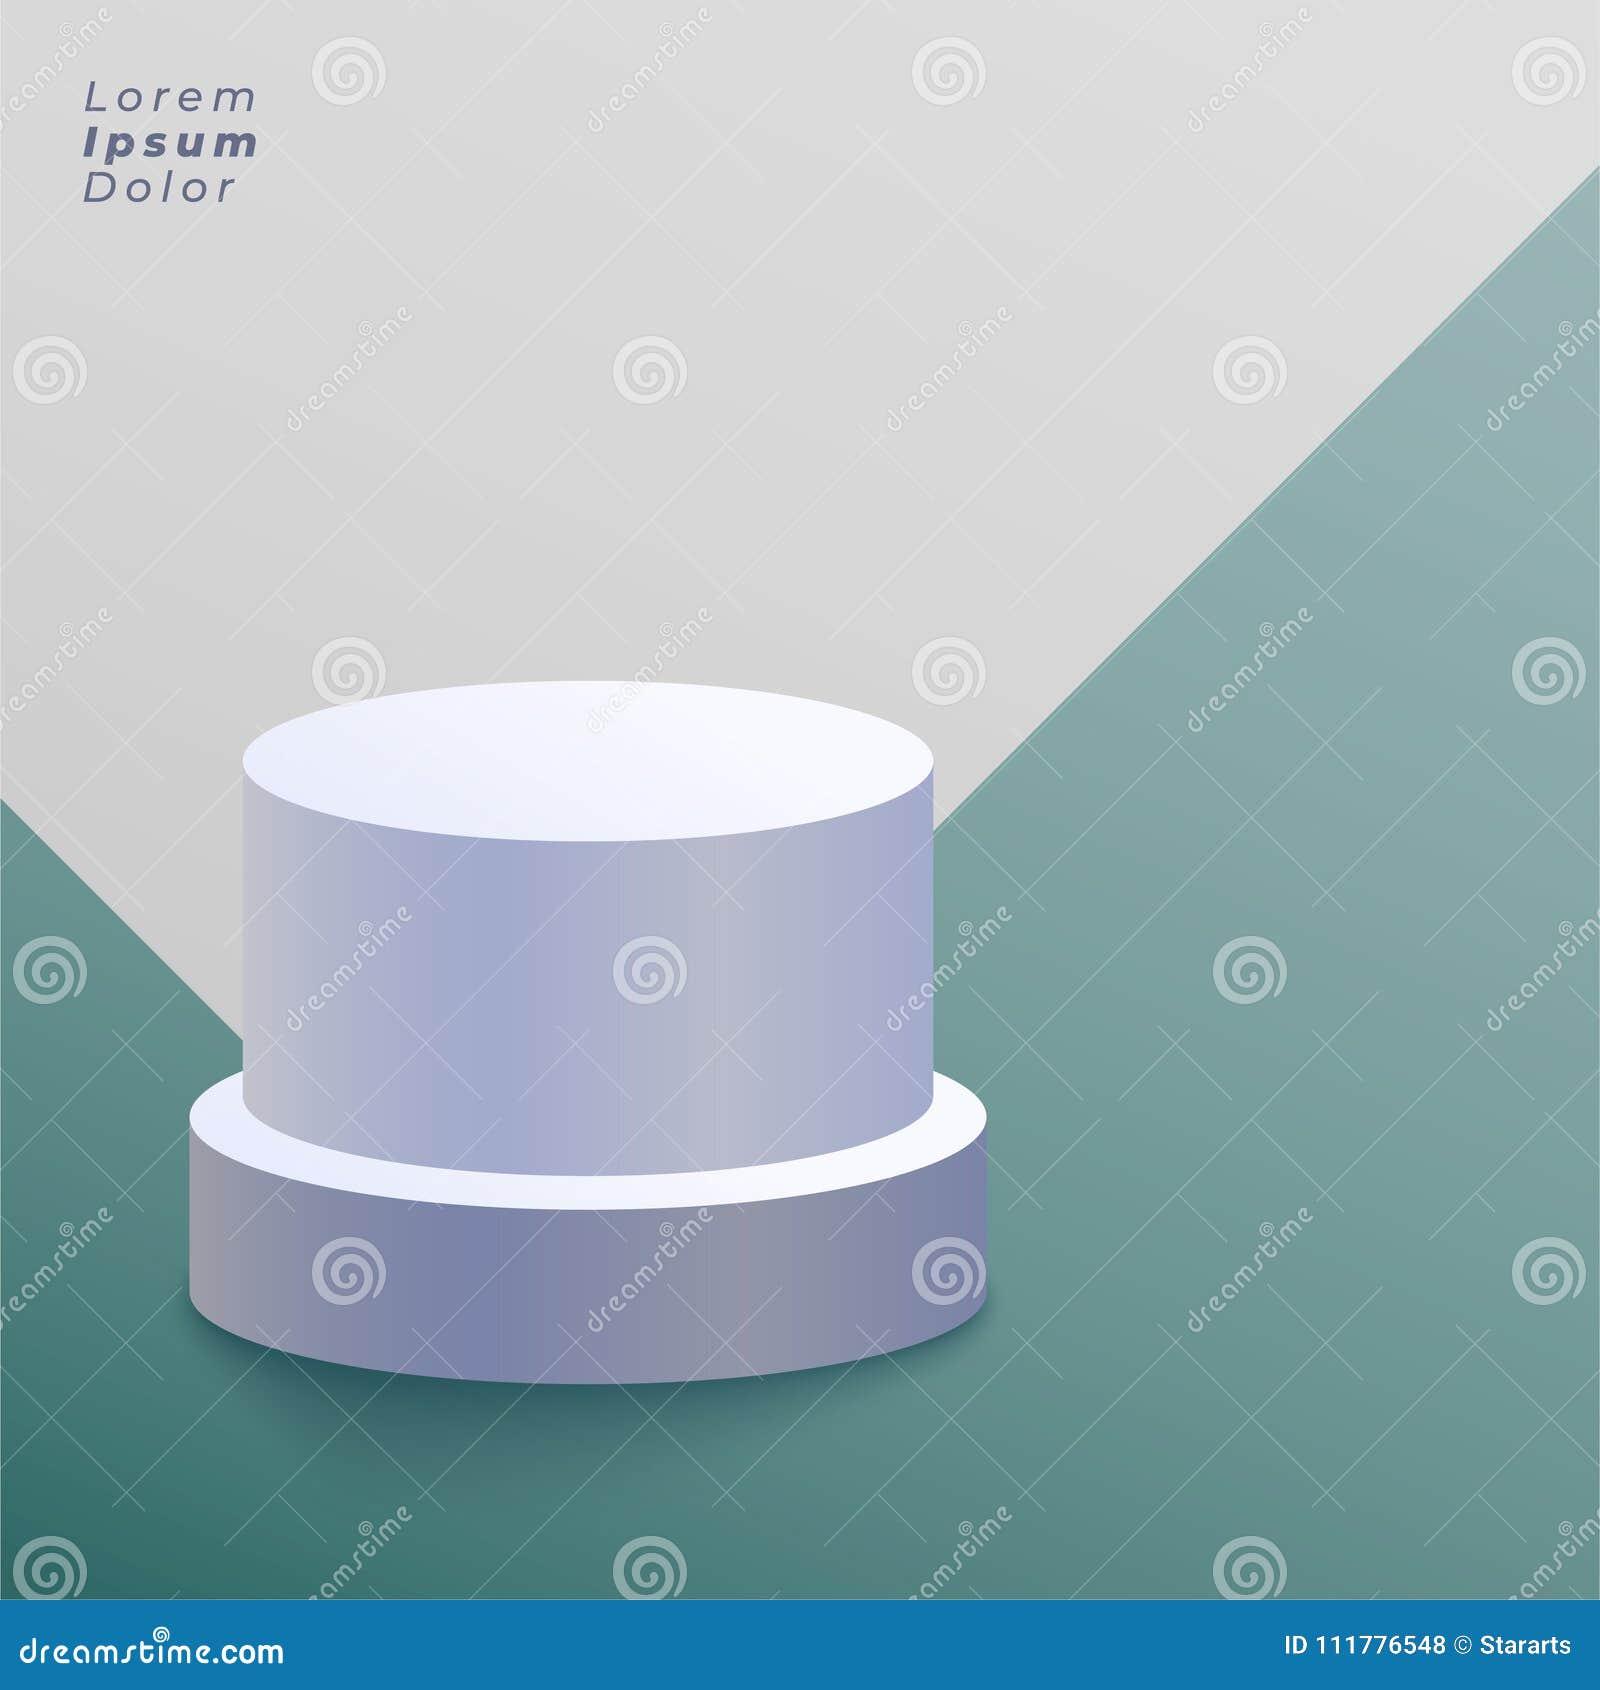 White round podium vector background